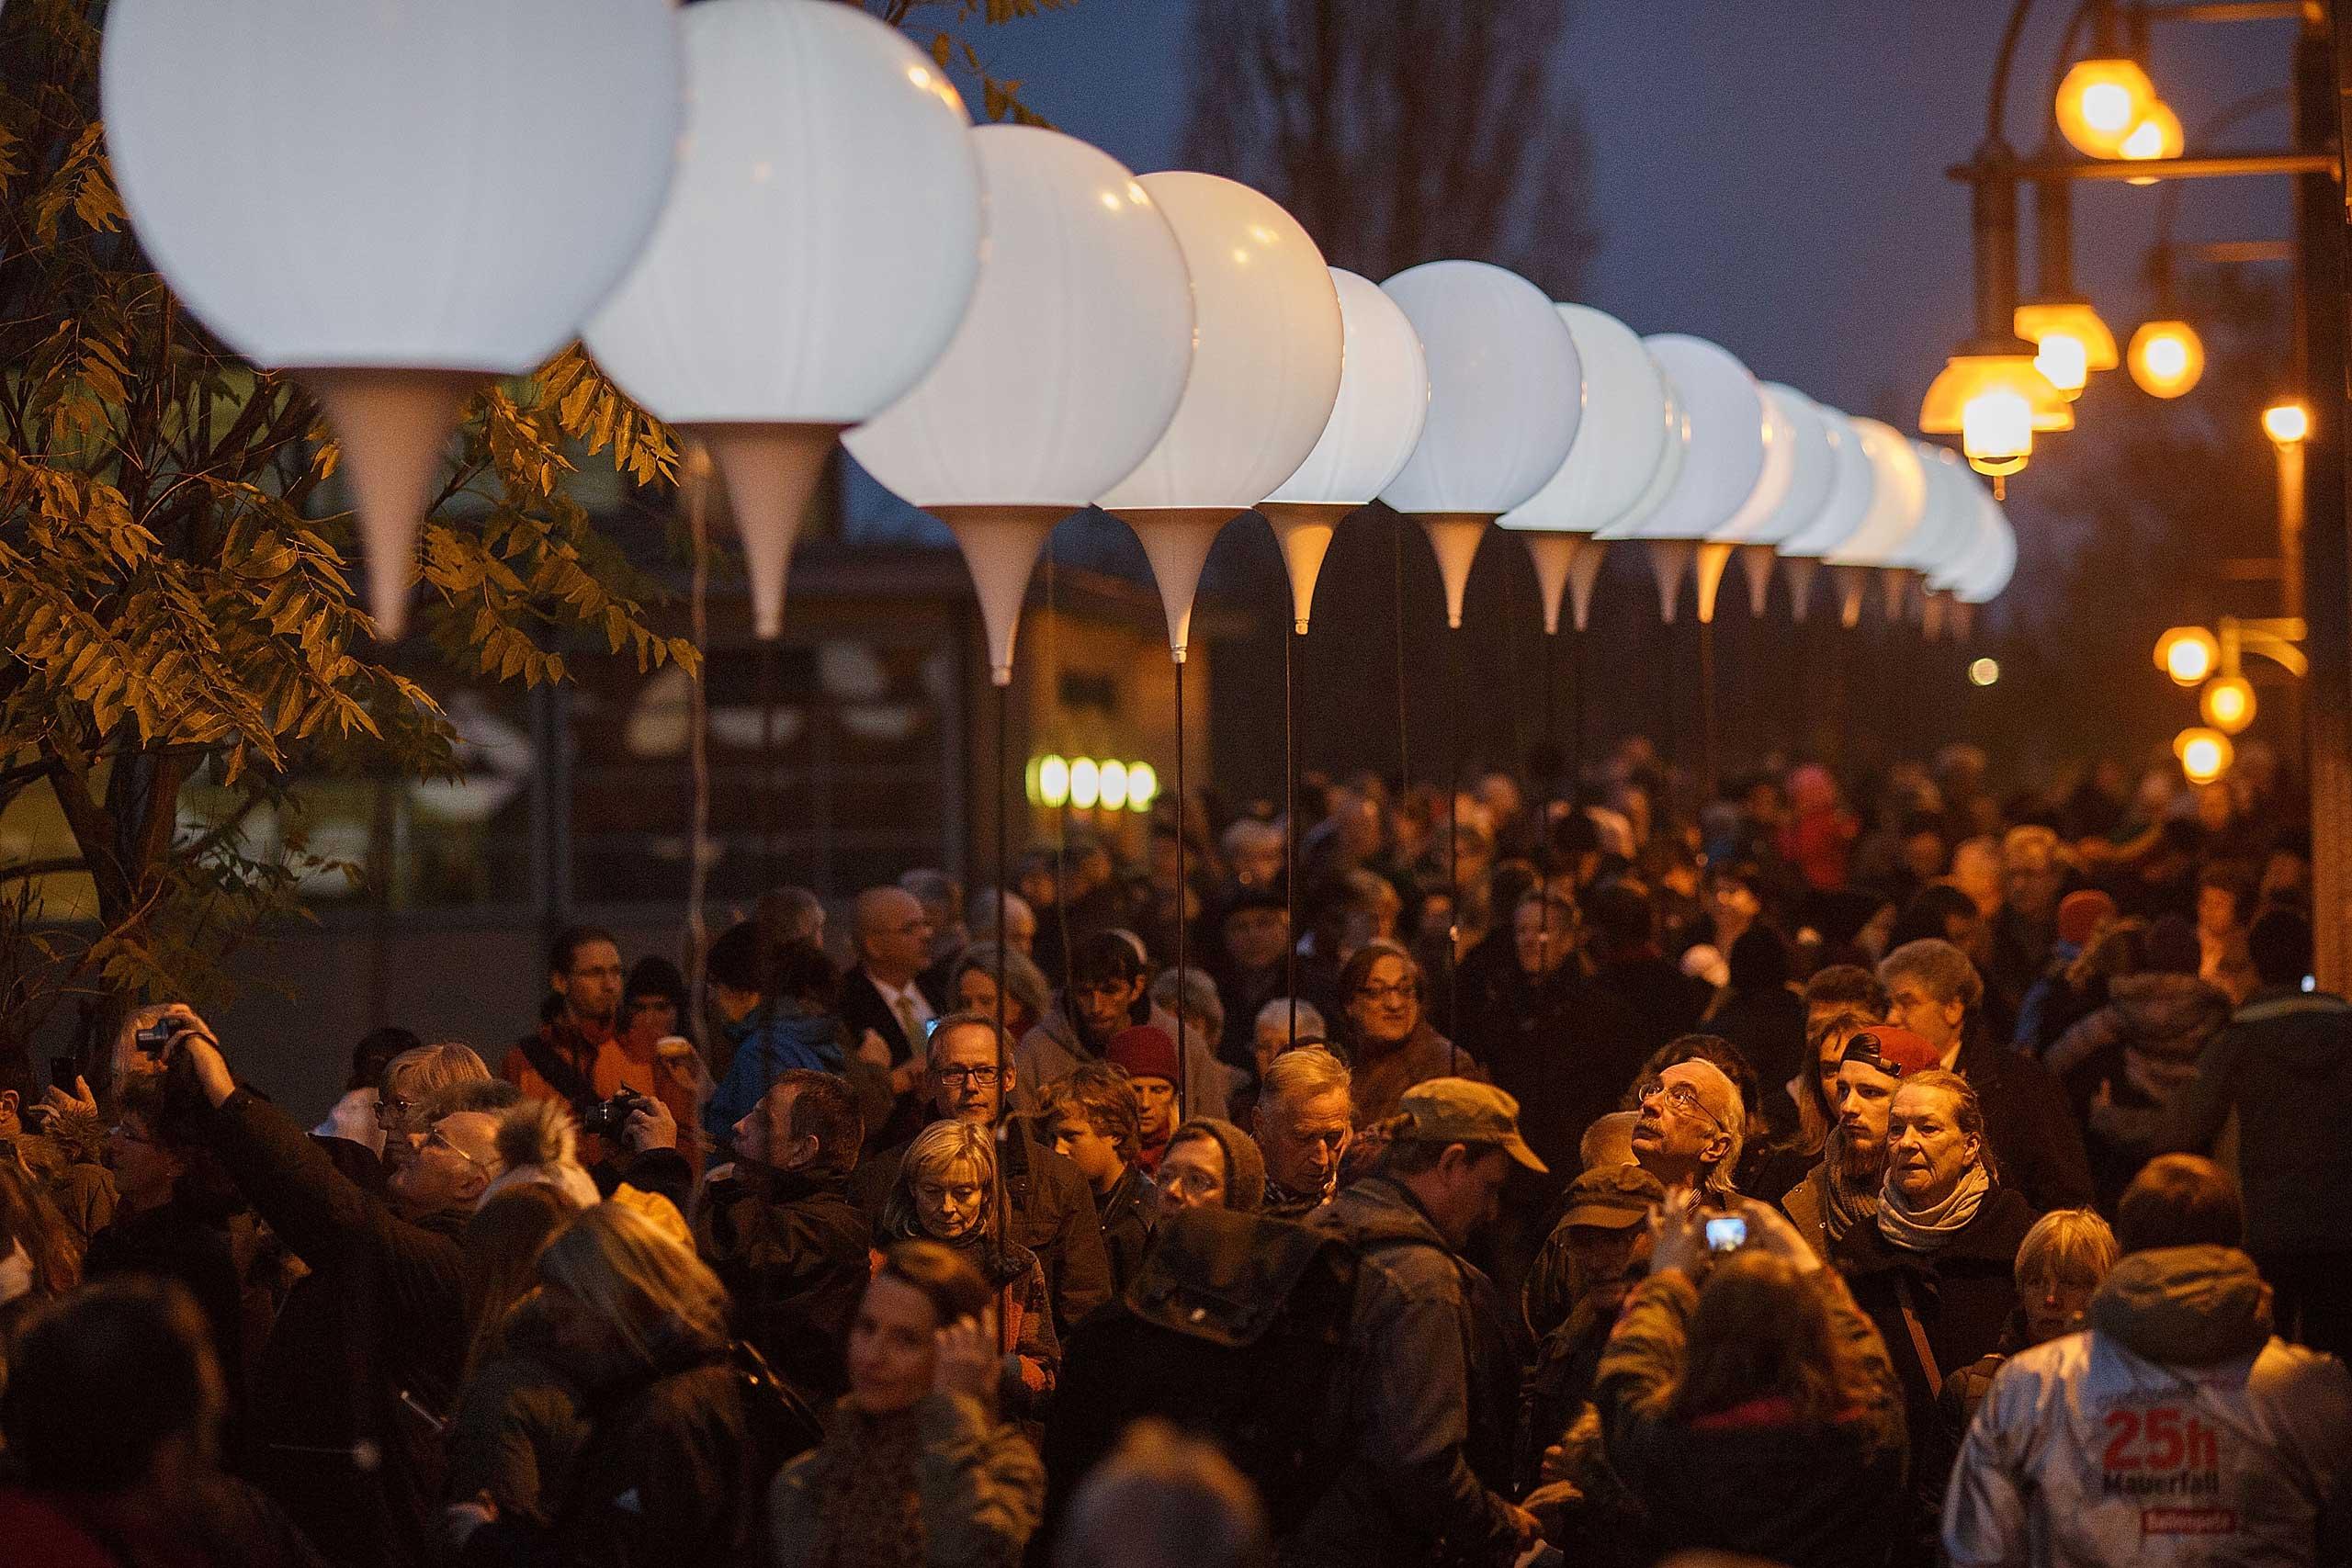 People gather on the Bösebrücke Bridge in Bornholmer Strasse on November 9, 2014 in Berlin, Germany.